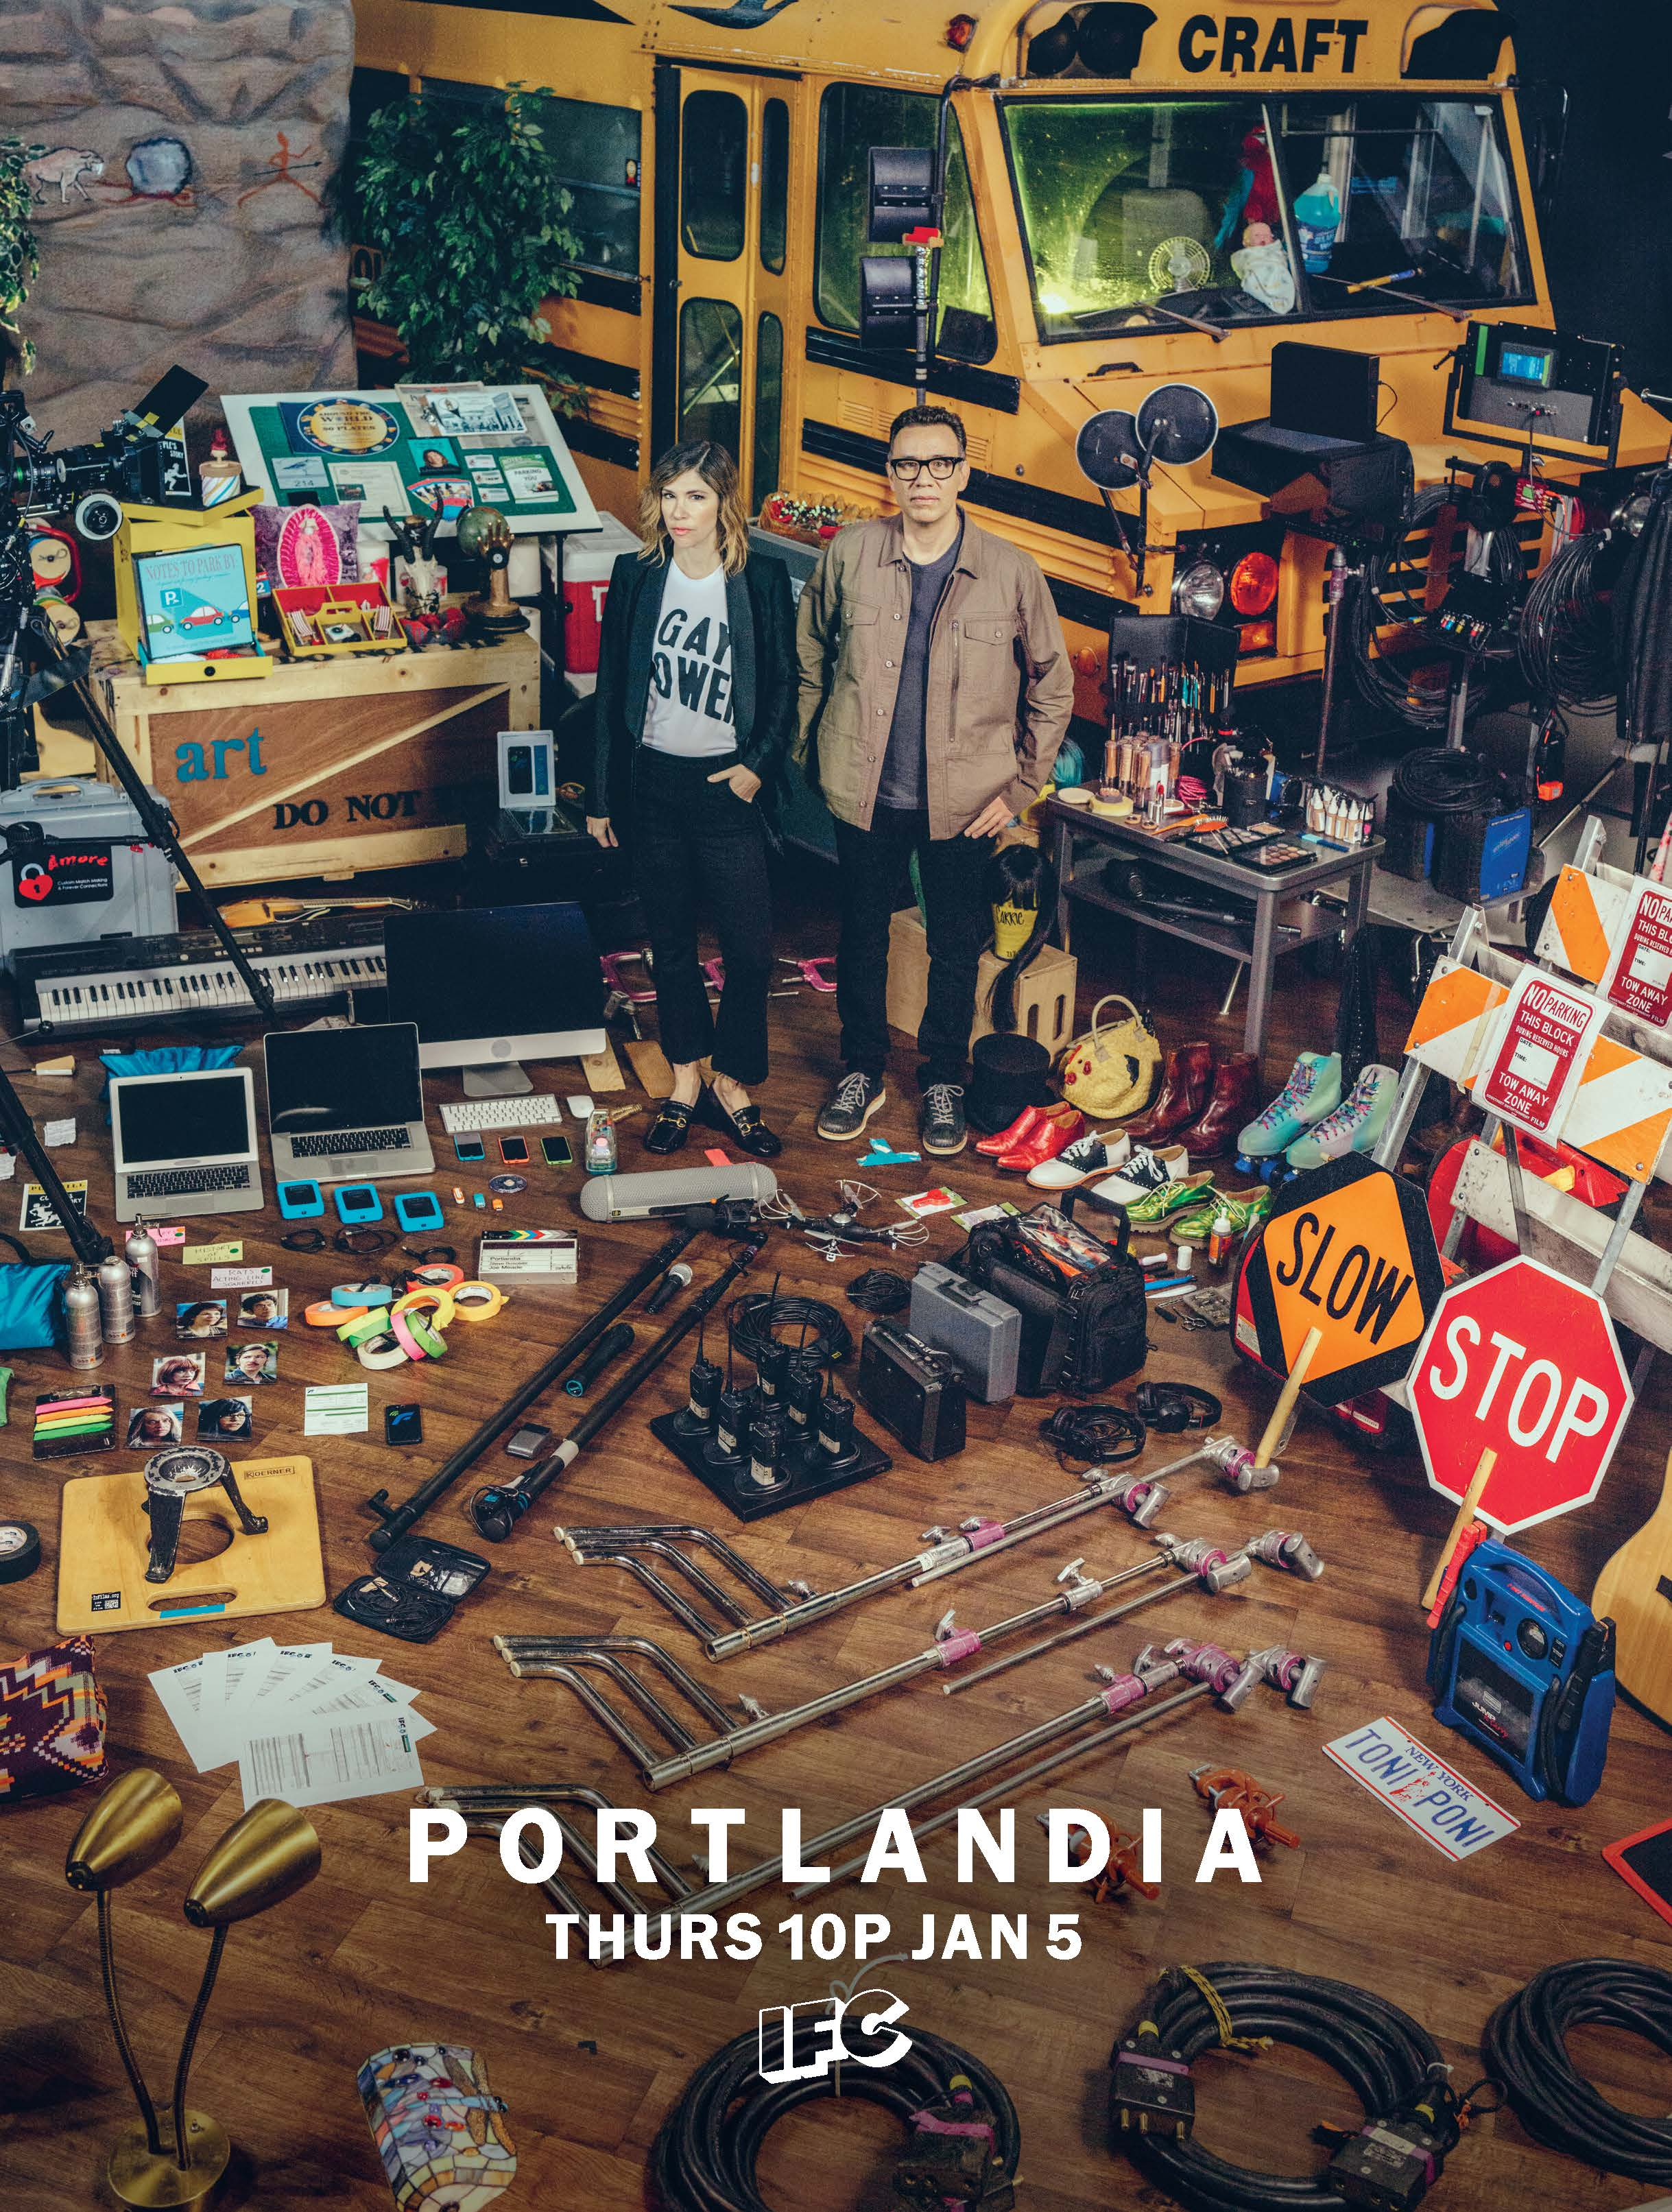 IFC_Portlandia_EW ad.jpg